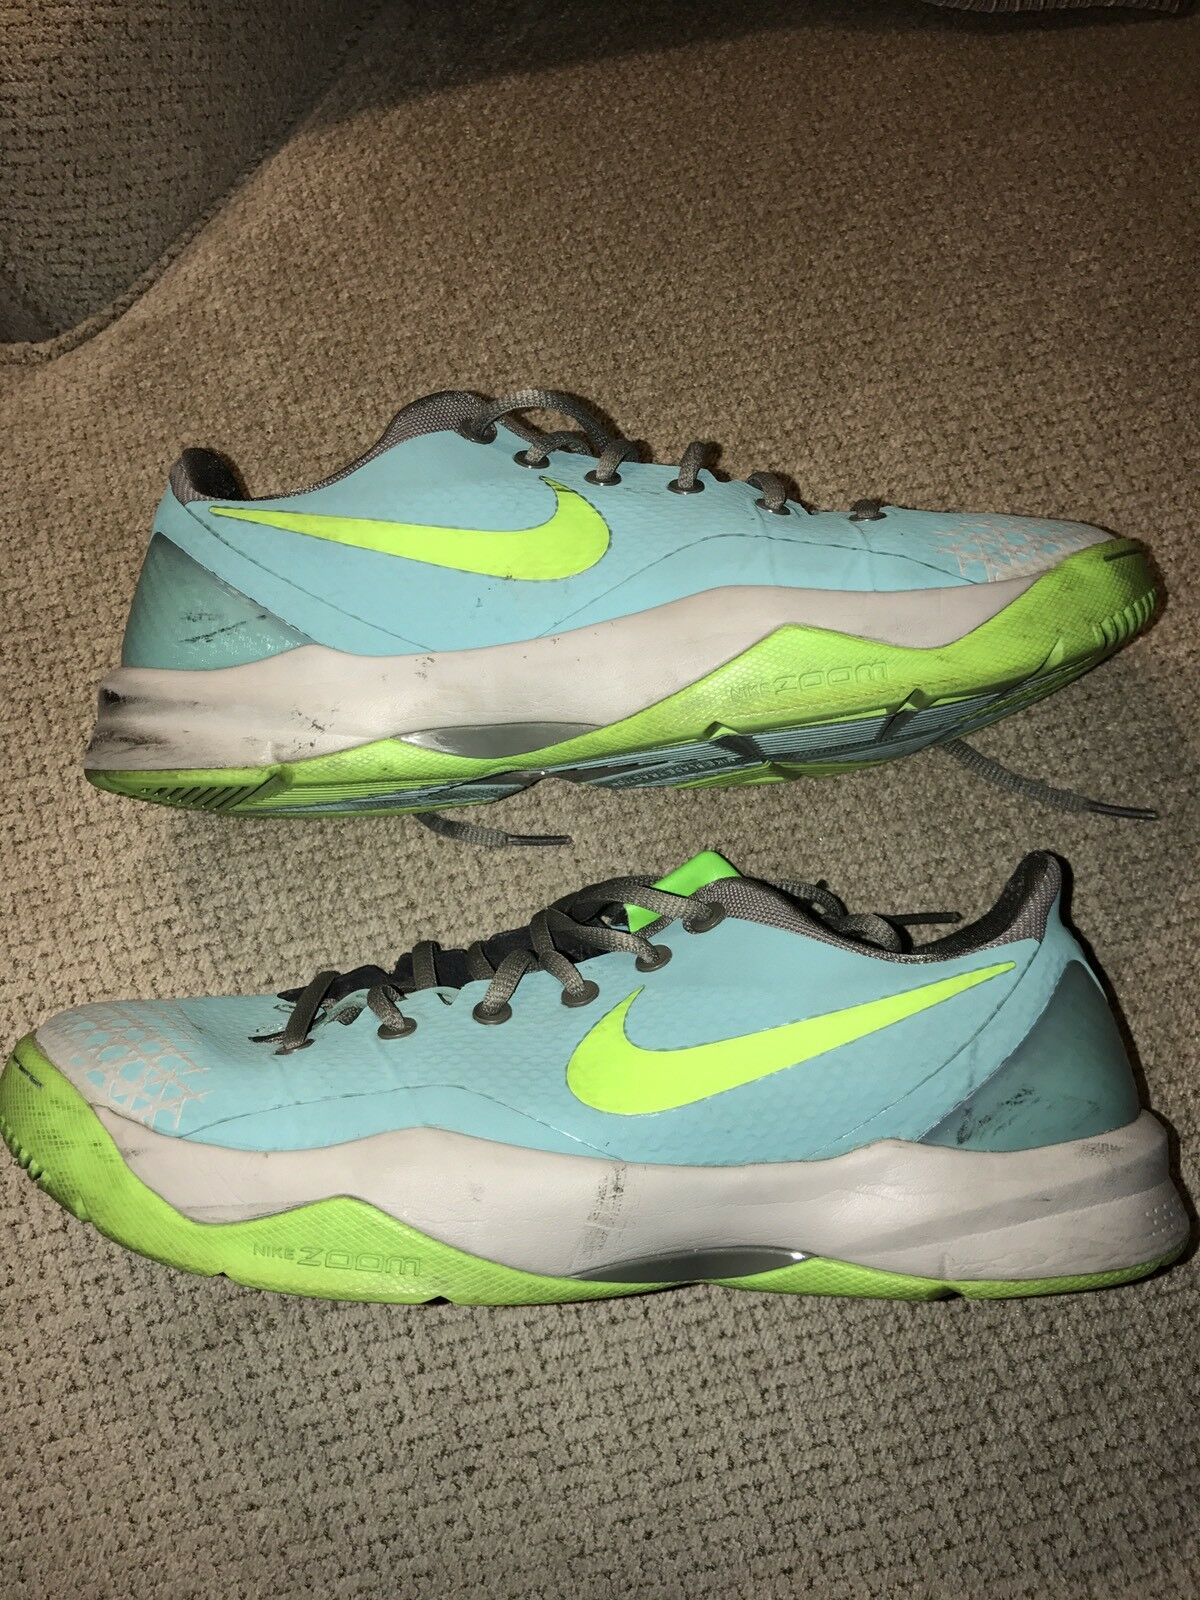 reputable site 3e0a0 39f49 ... 2013 Nike Zoom Kobe Venomenon 4 men men men sz 12 jade green 635578 300  basketball ...